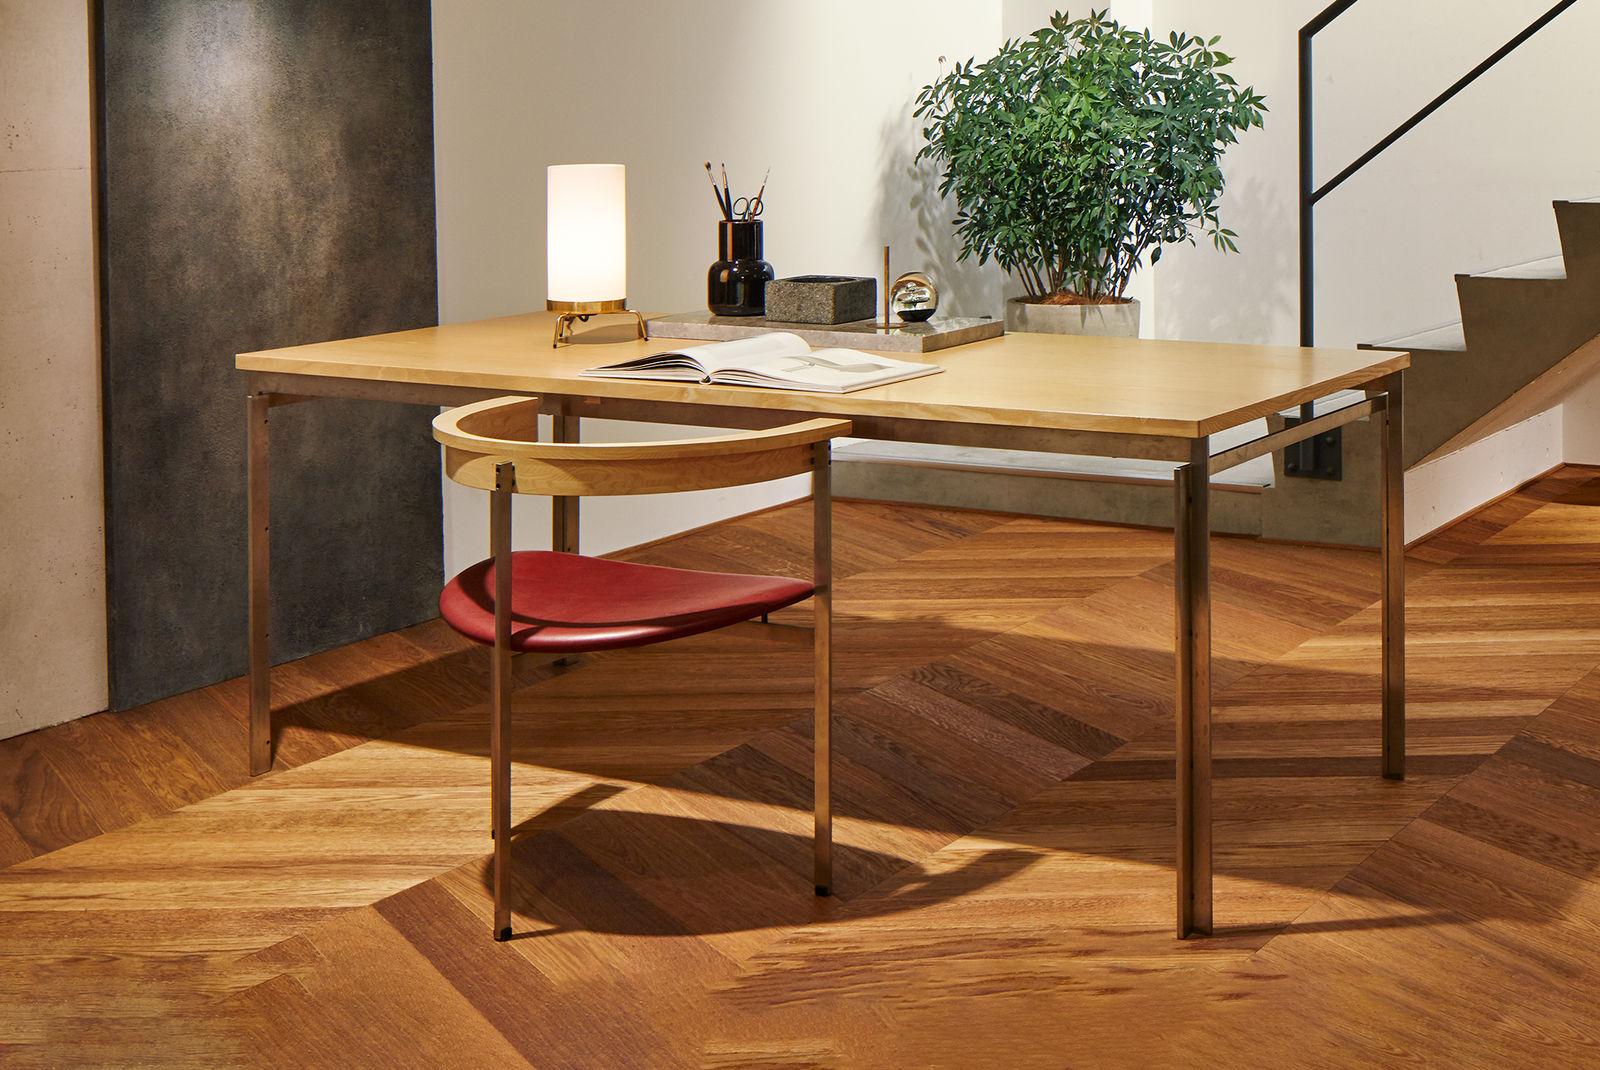 PK25 Lounge Chair designed by Poul Kjærholm